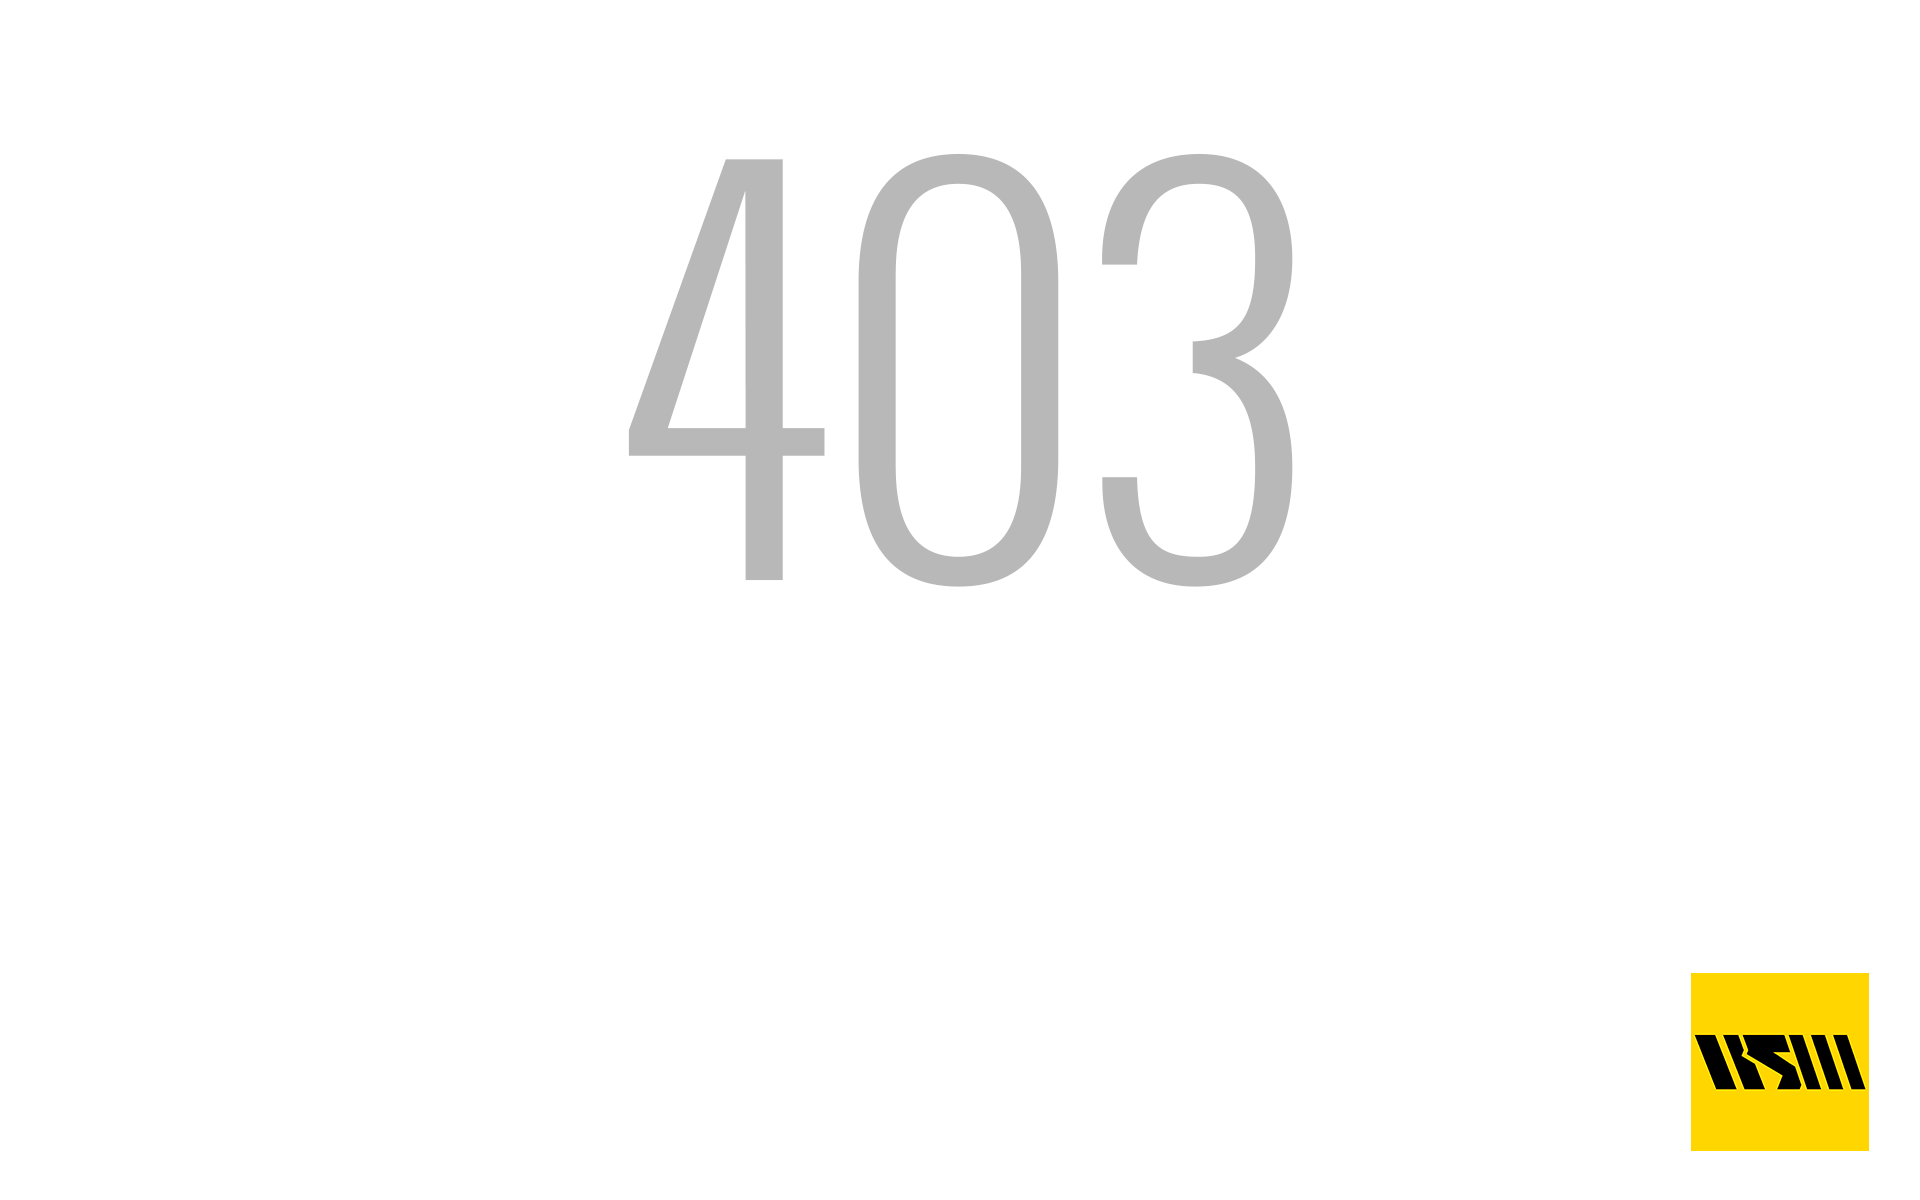 Error 403 (access denied)